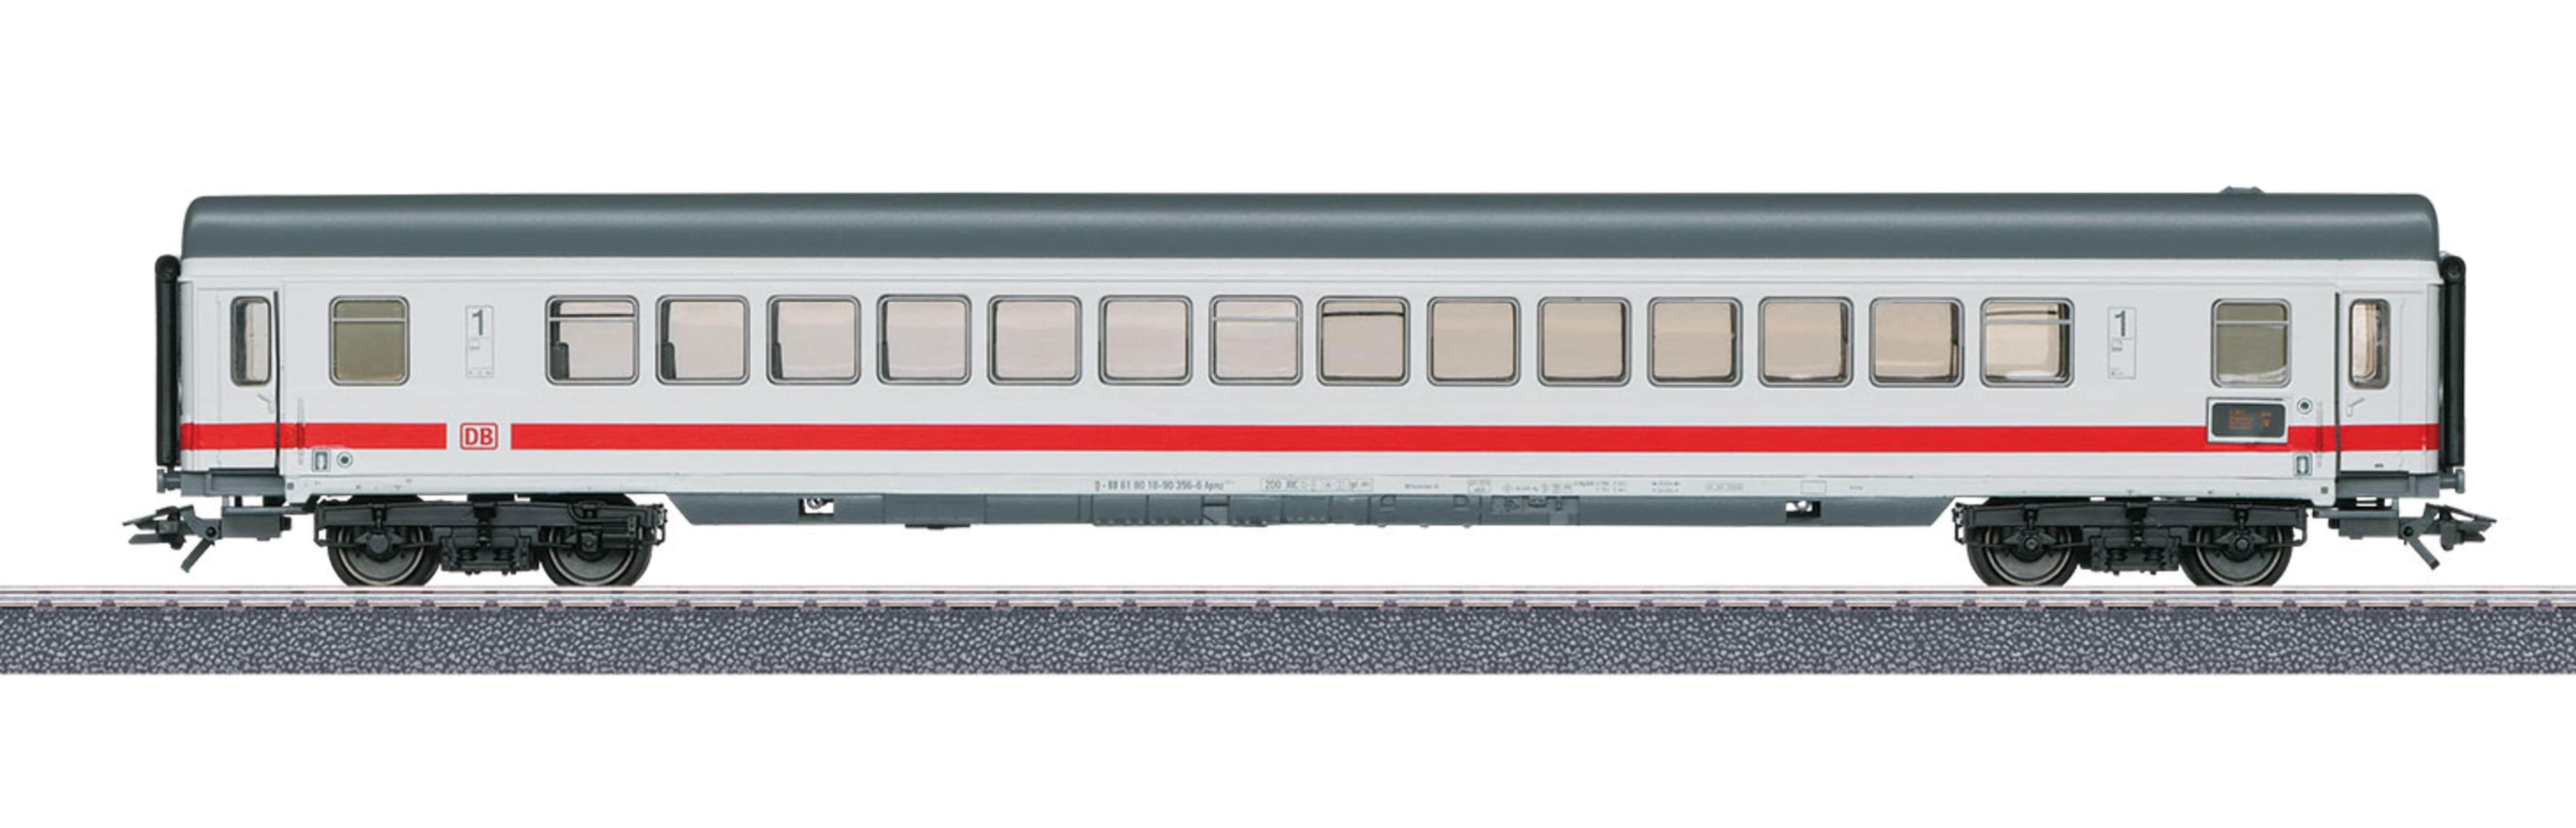 Märklin Personenwagen IC Schnellzugwagen 1. Klasse DB AG - 40500, Spur H0